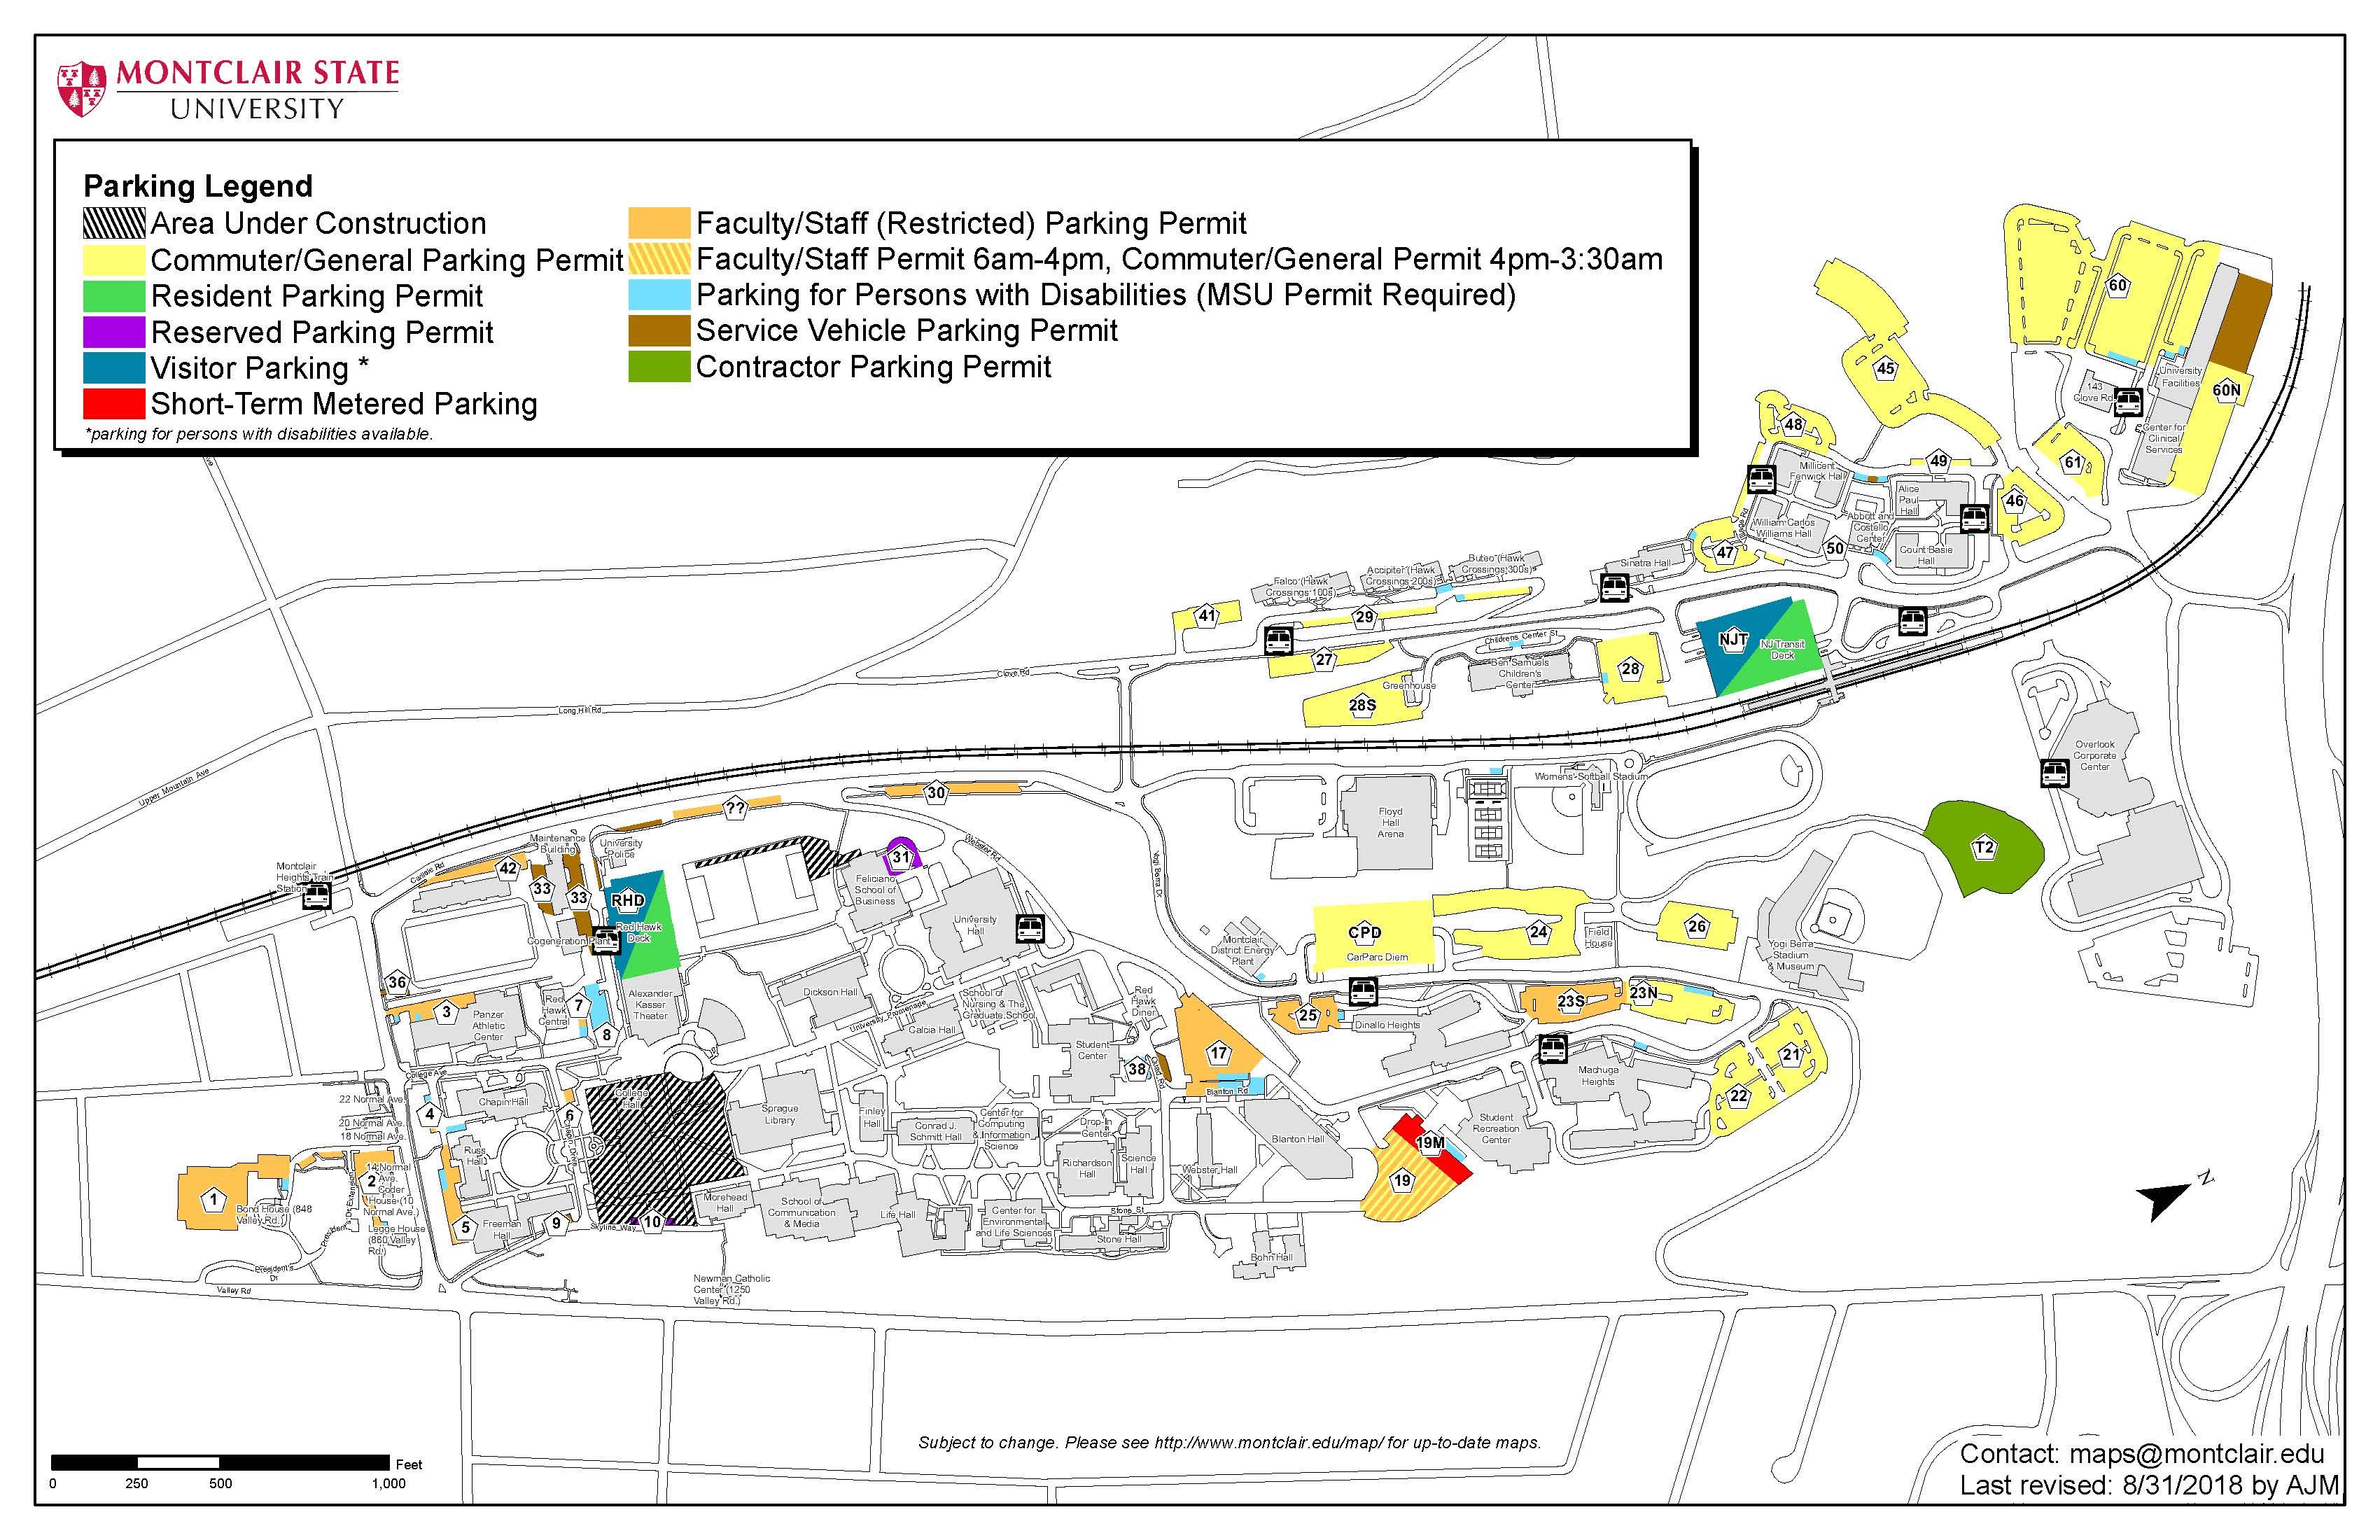 Montclair State University Campus Map Parking And Shuttles – Commuter Life   Montclair State University